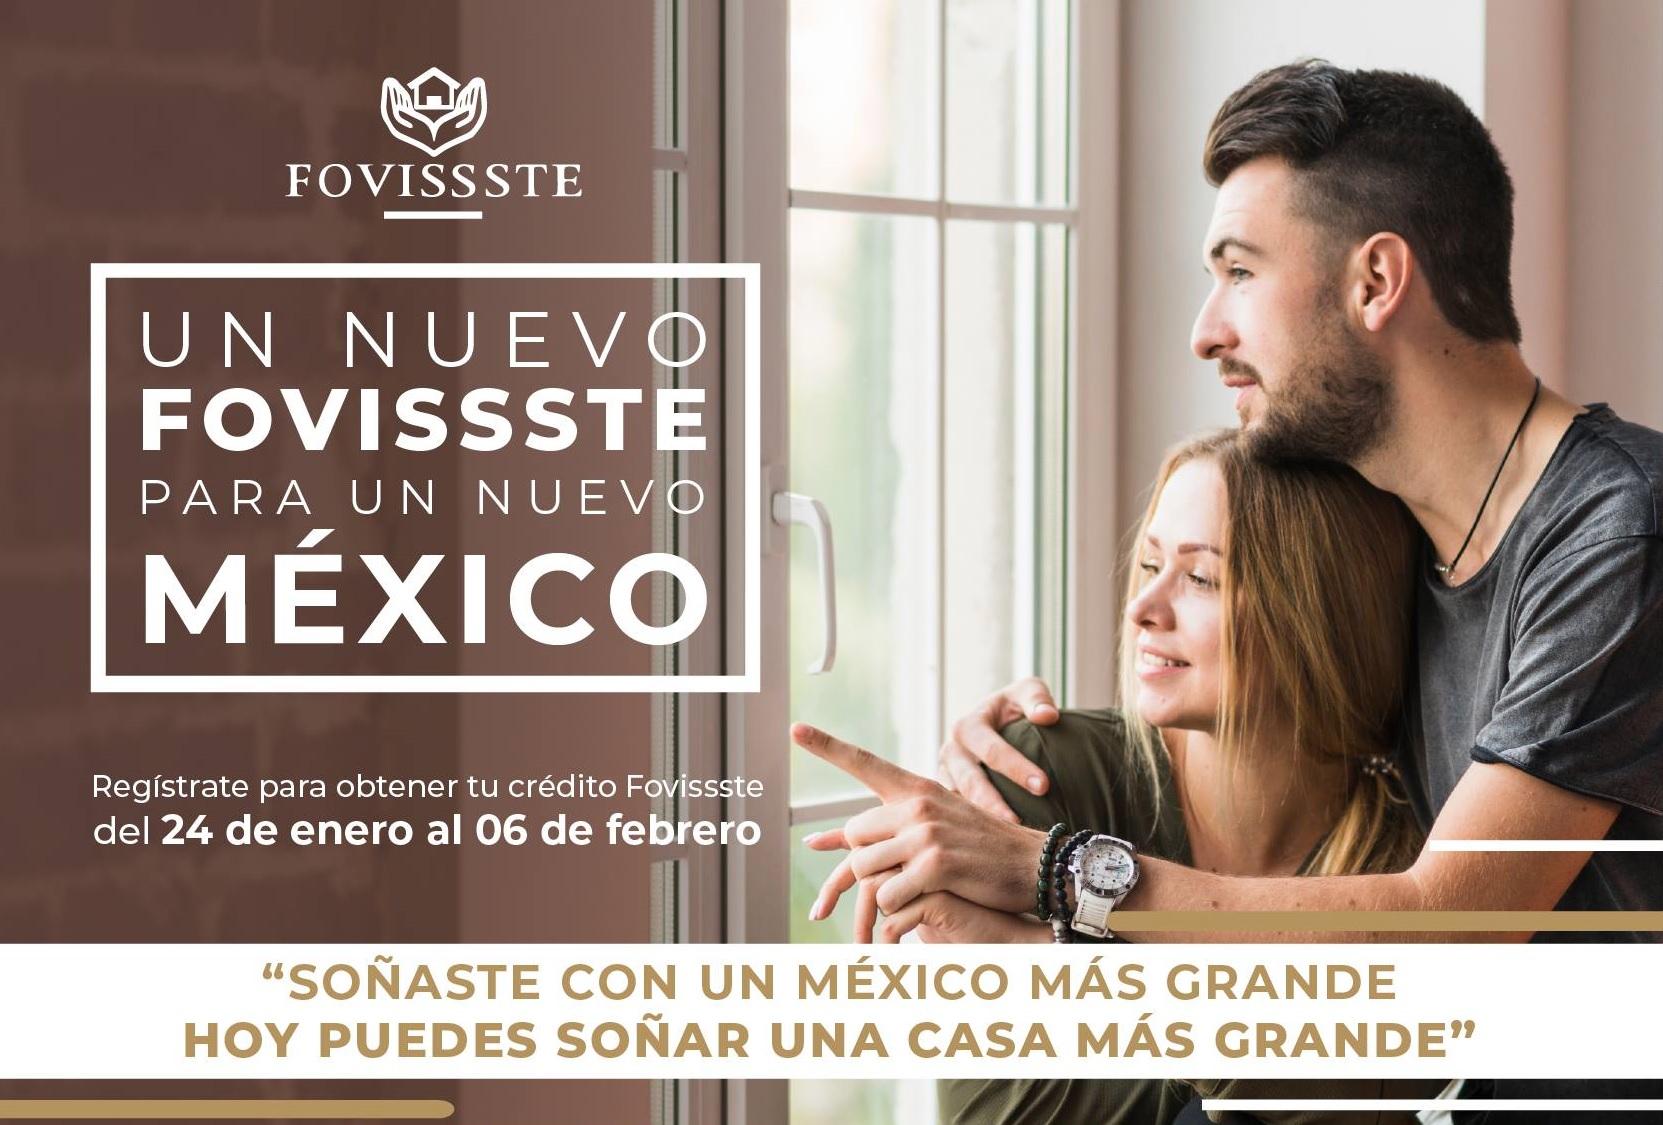 Pareja abrazada visualiza su nuevo hogar adquirido con crédito FOVISSSTE